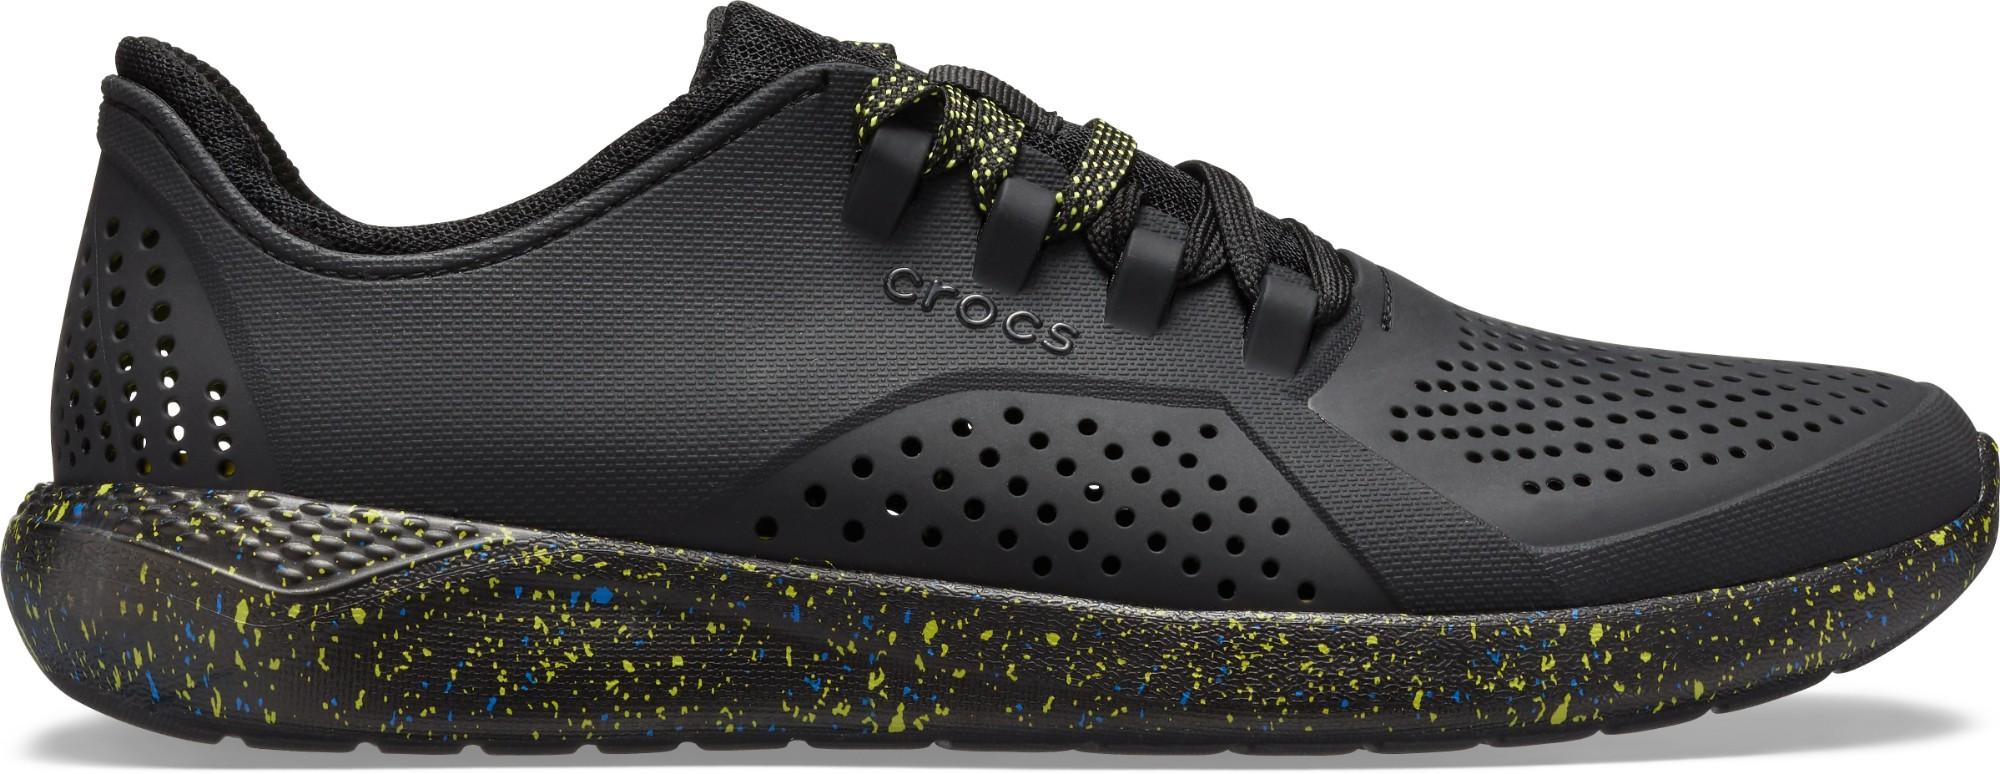 Crocs™ LiteRide Hyper Bold Pacer Men's Black/Black 43,5